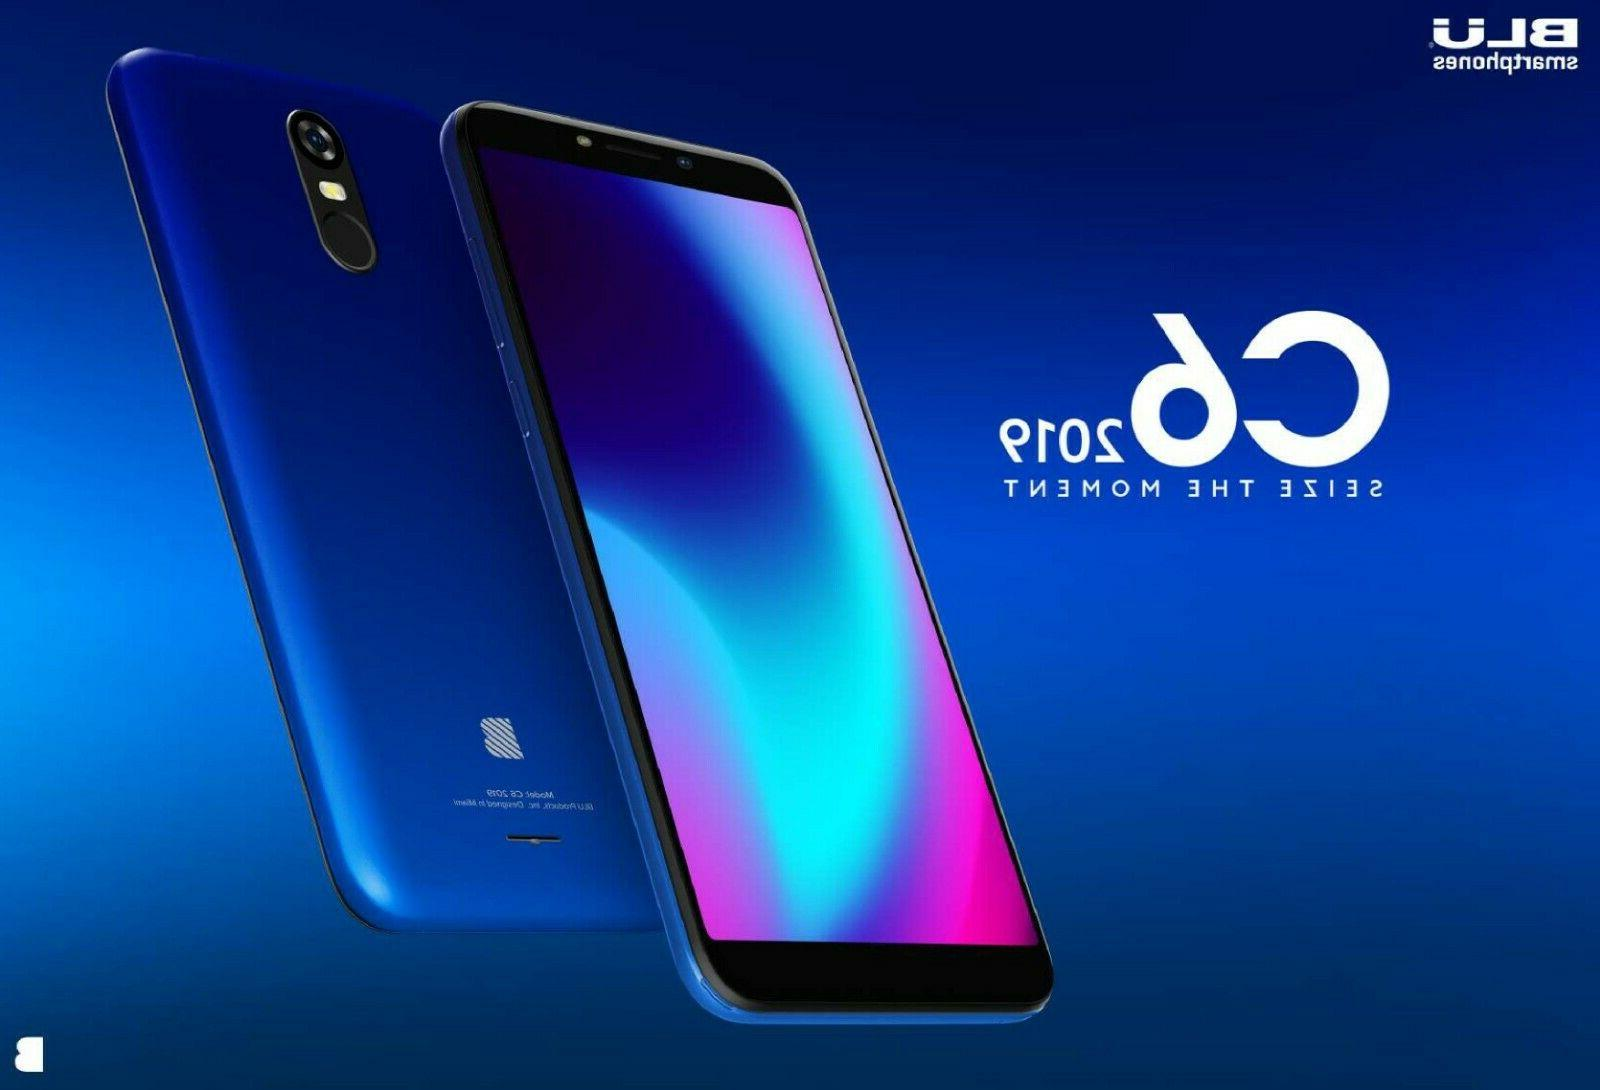 Blu C6 Unlocked Cell Phone 16GB/1GB ROOM Oreo